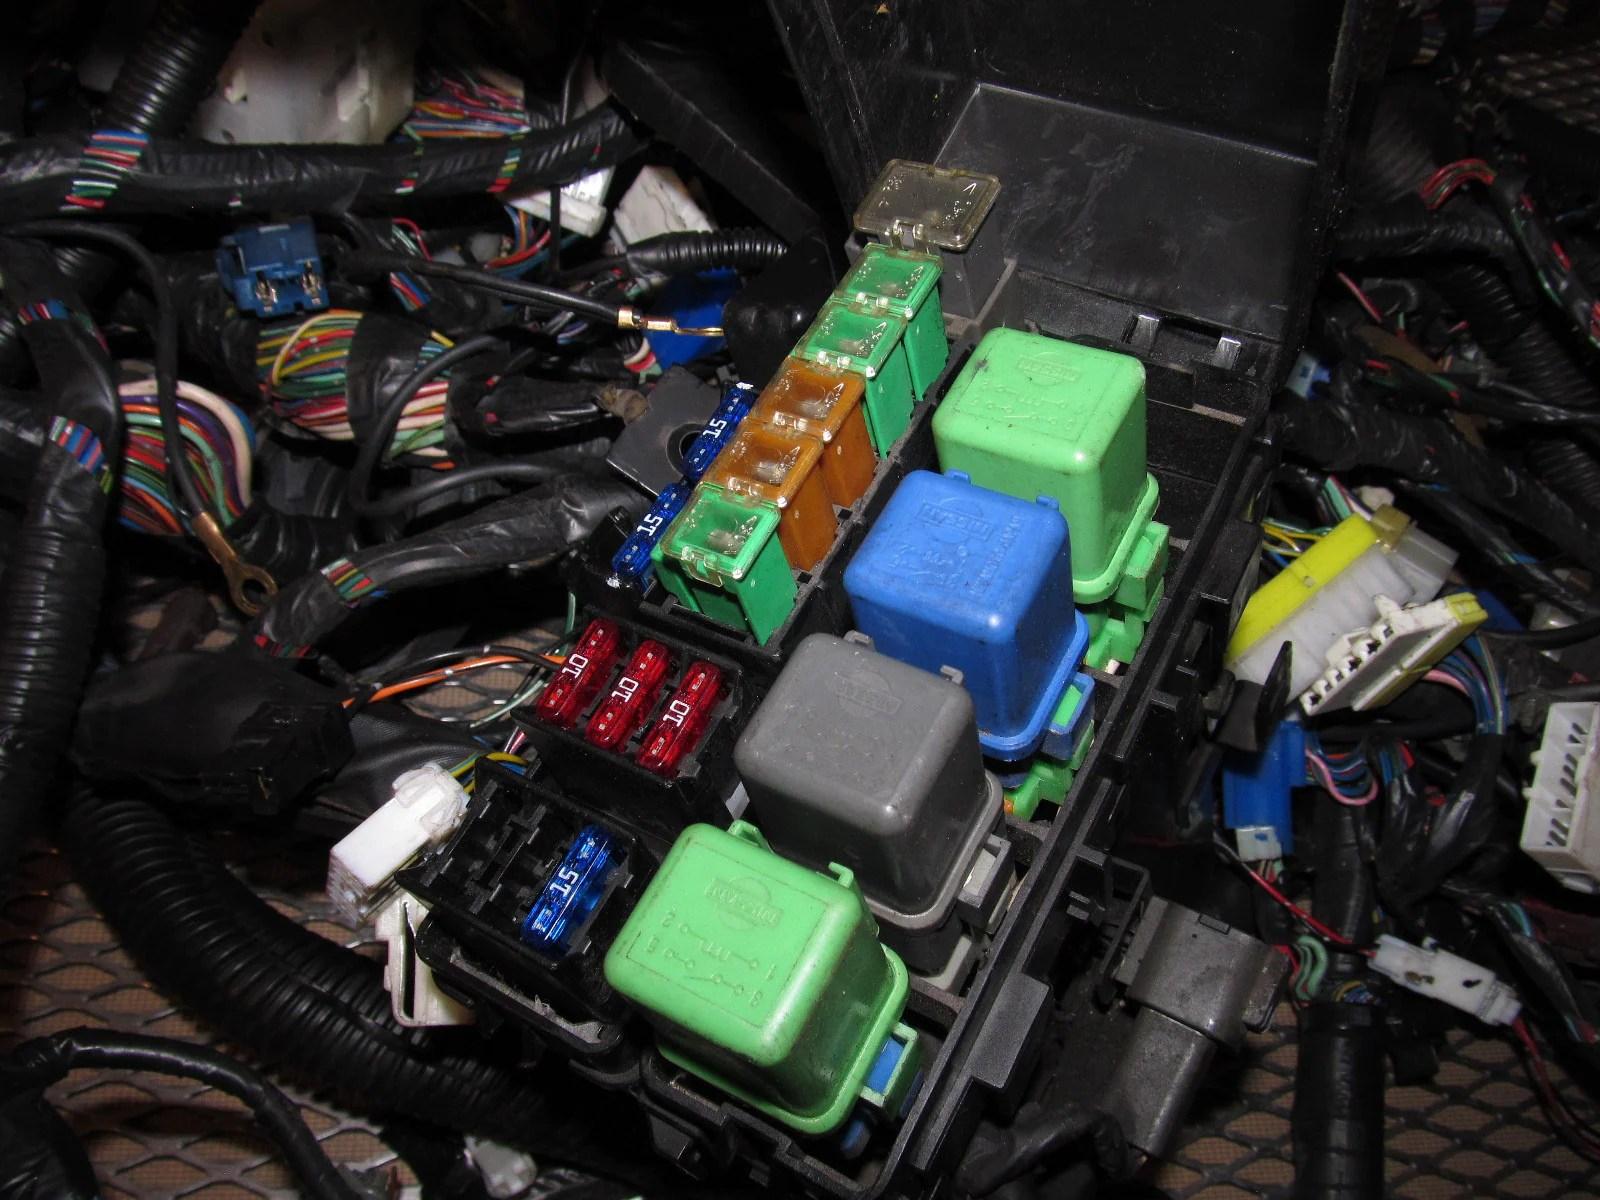 hight resolution of 91 92 93 94 nissan 240sx oem fuse box wiring harness autopartone com f150 fuse box